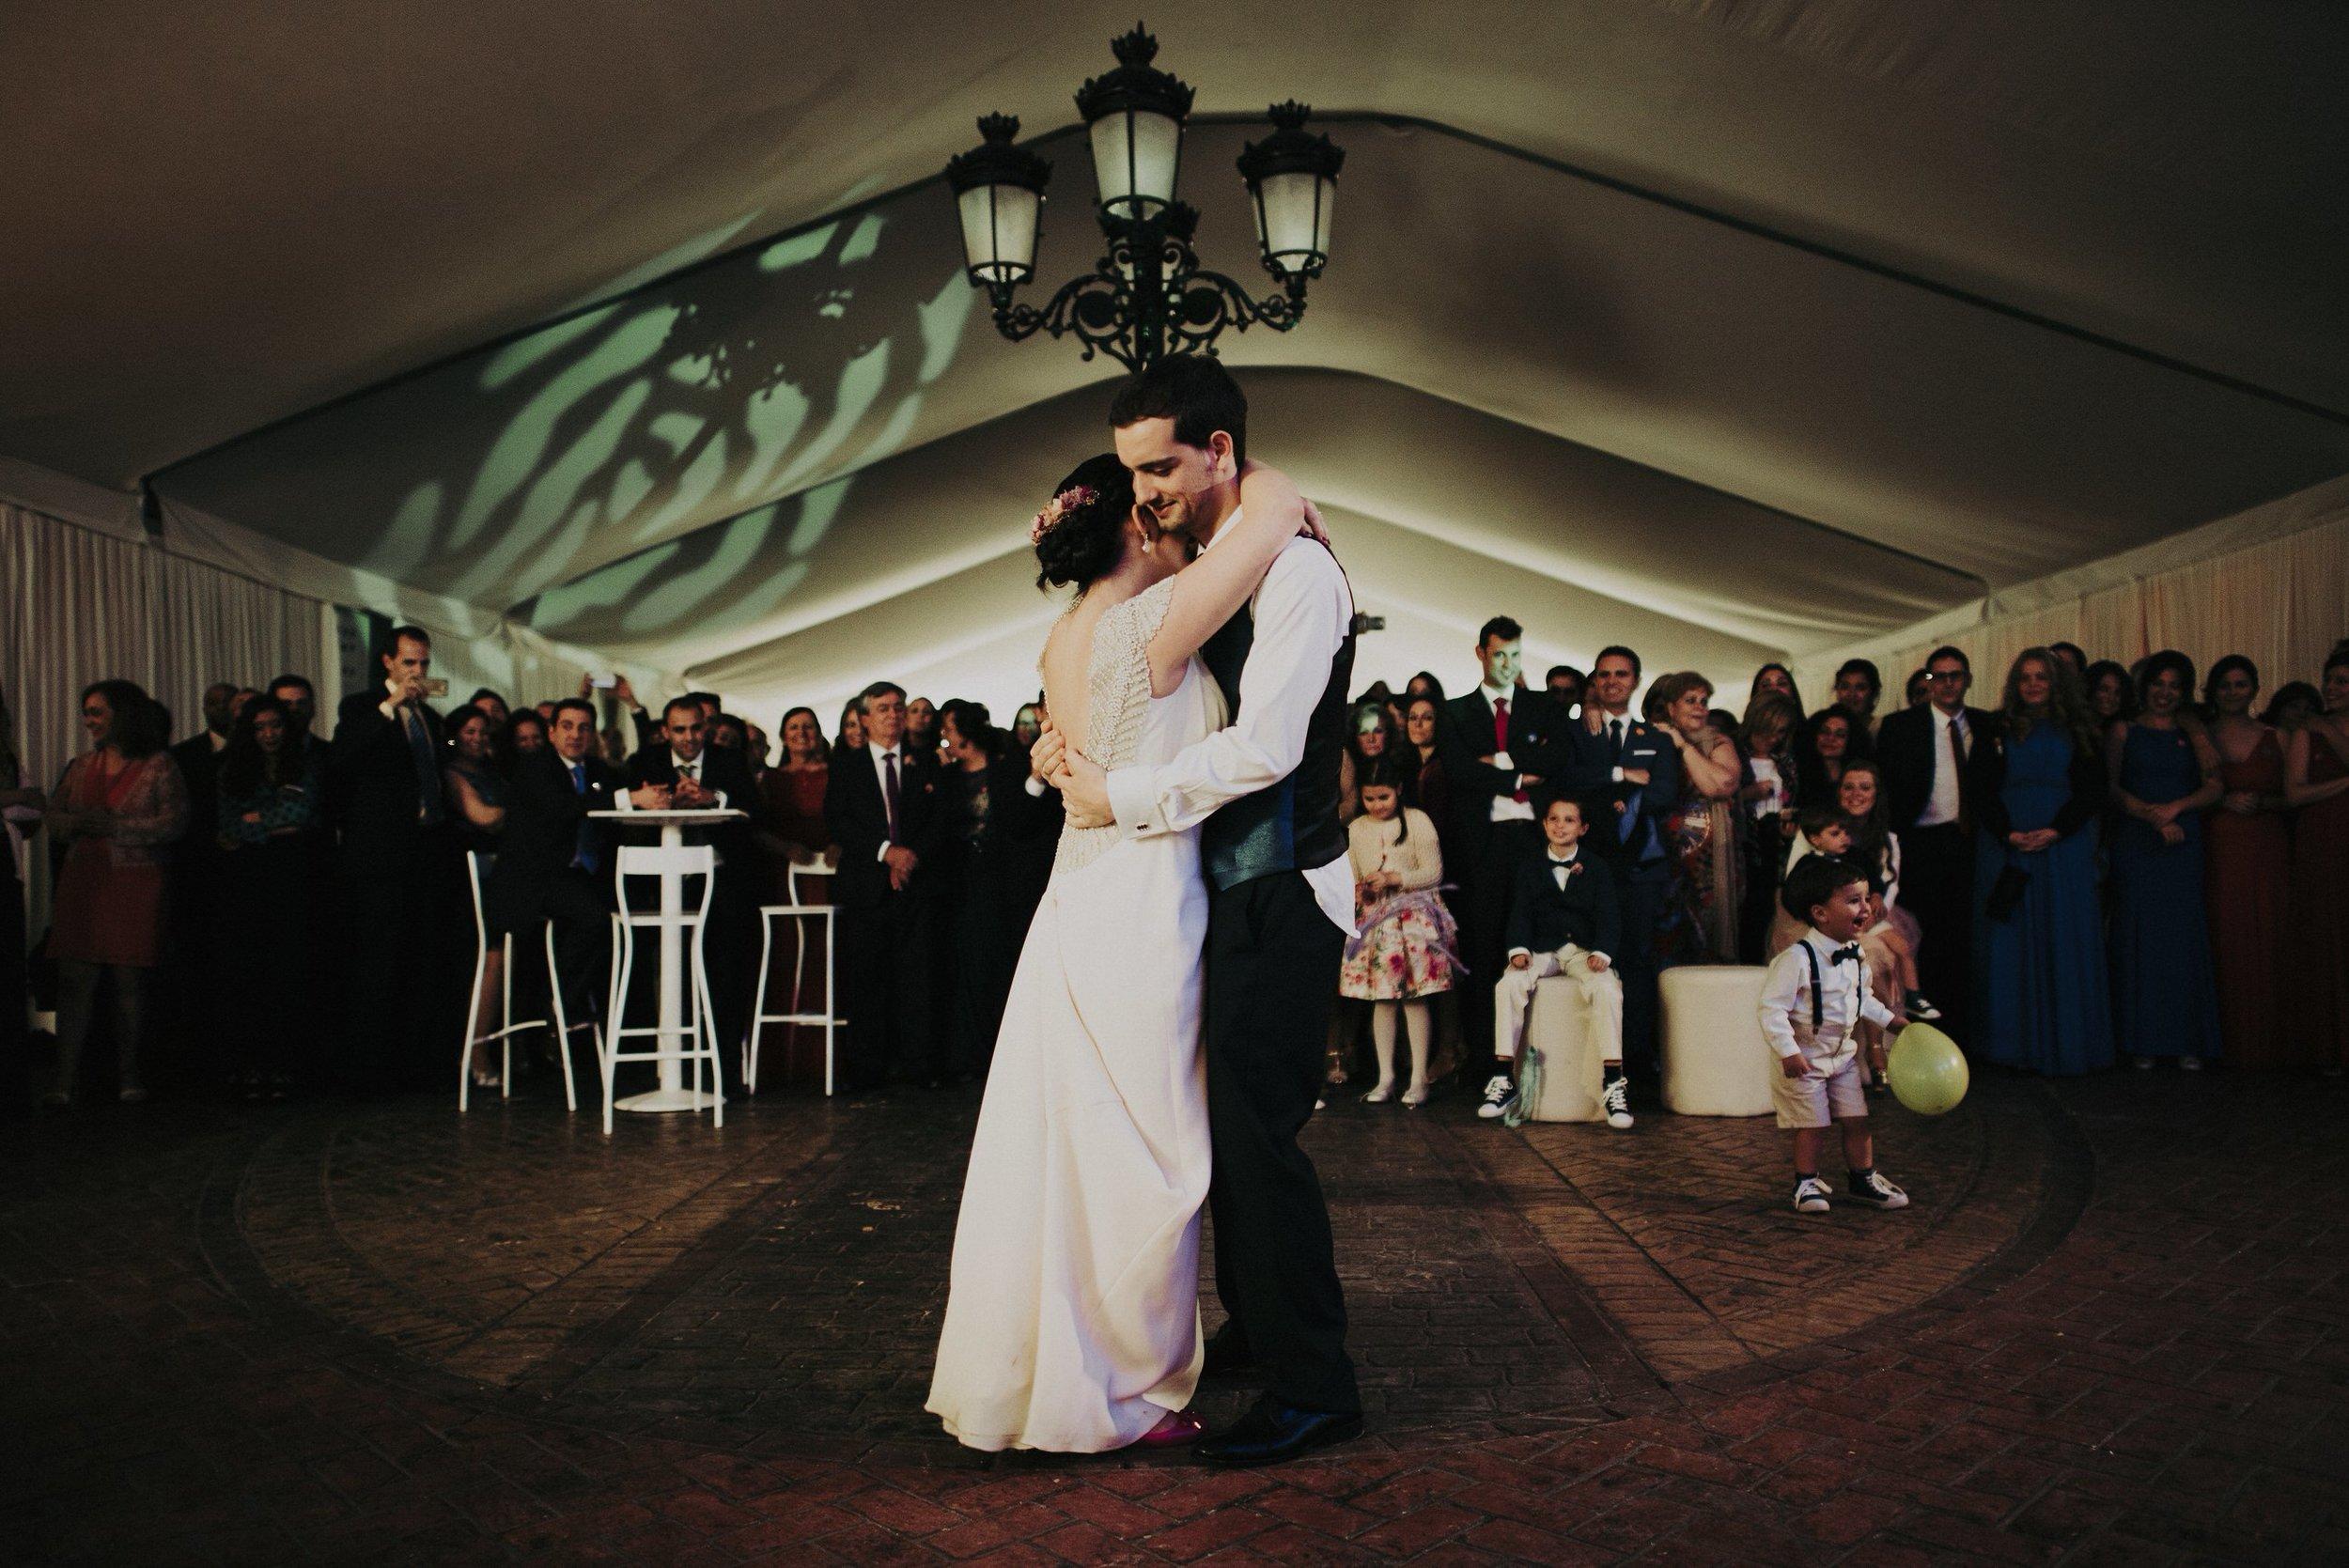 Laura & Rubén - boda en utrera - Santa clotilde- Manolo mayo - Fotografo de boda - Andrés Amarillo AAA_1075-Exposure (41).jpg